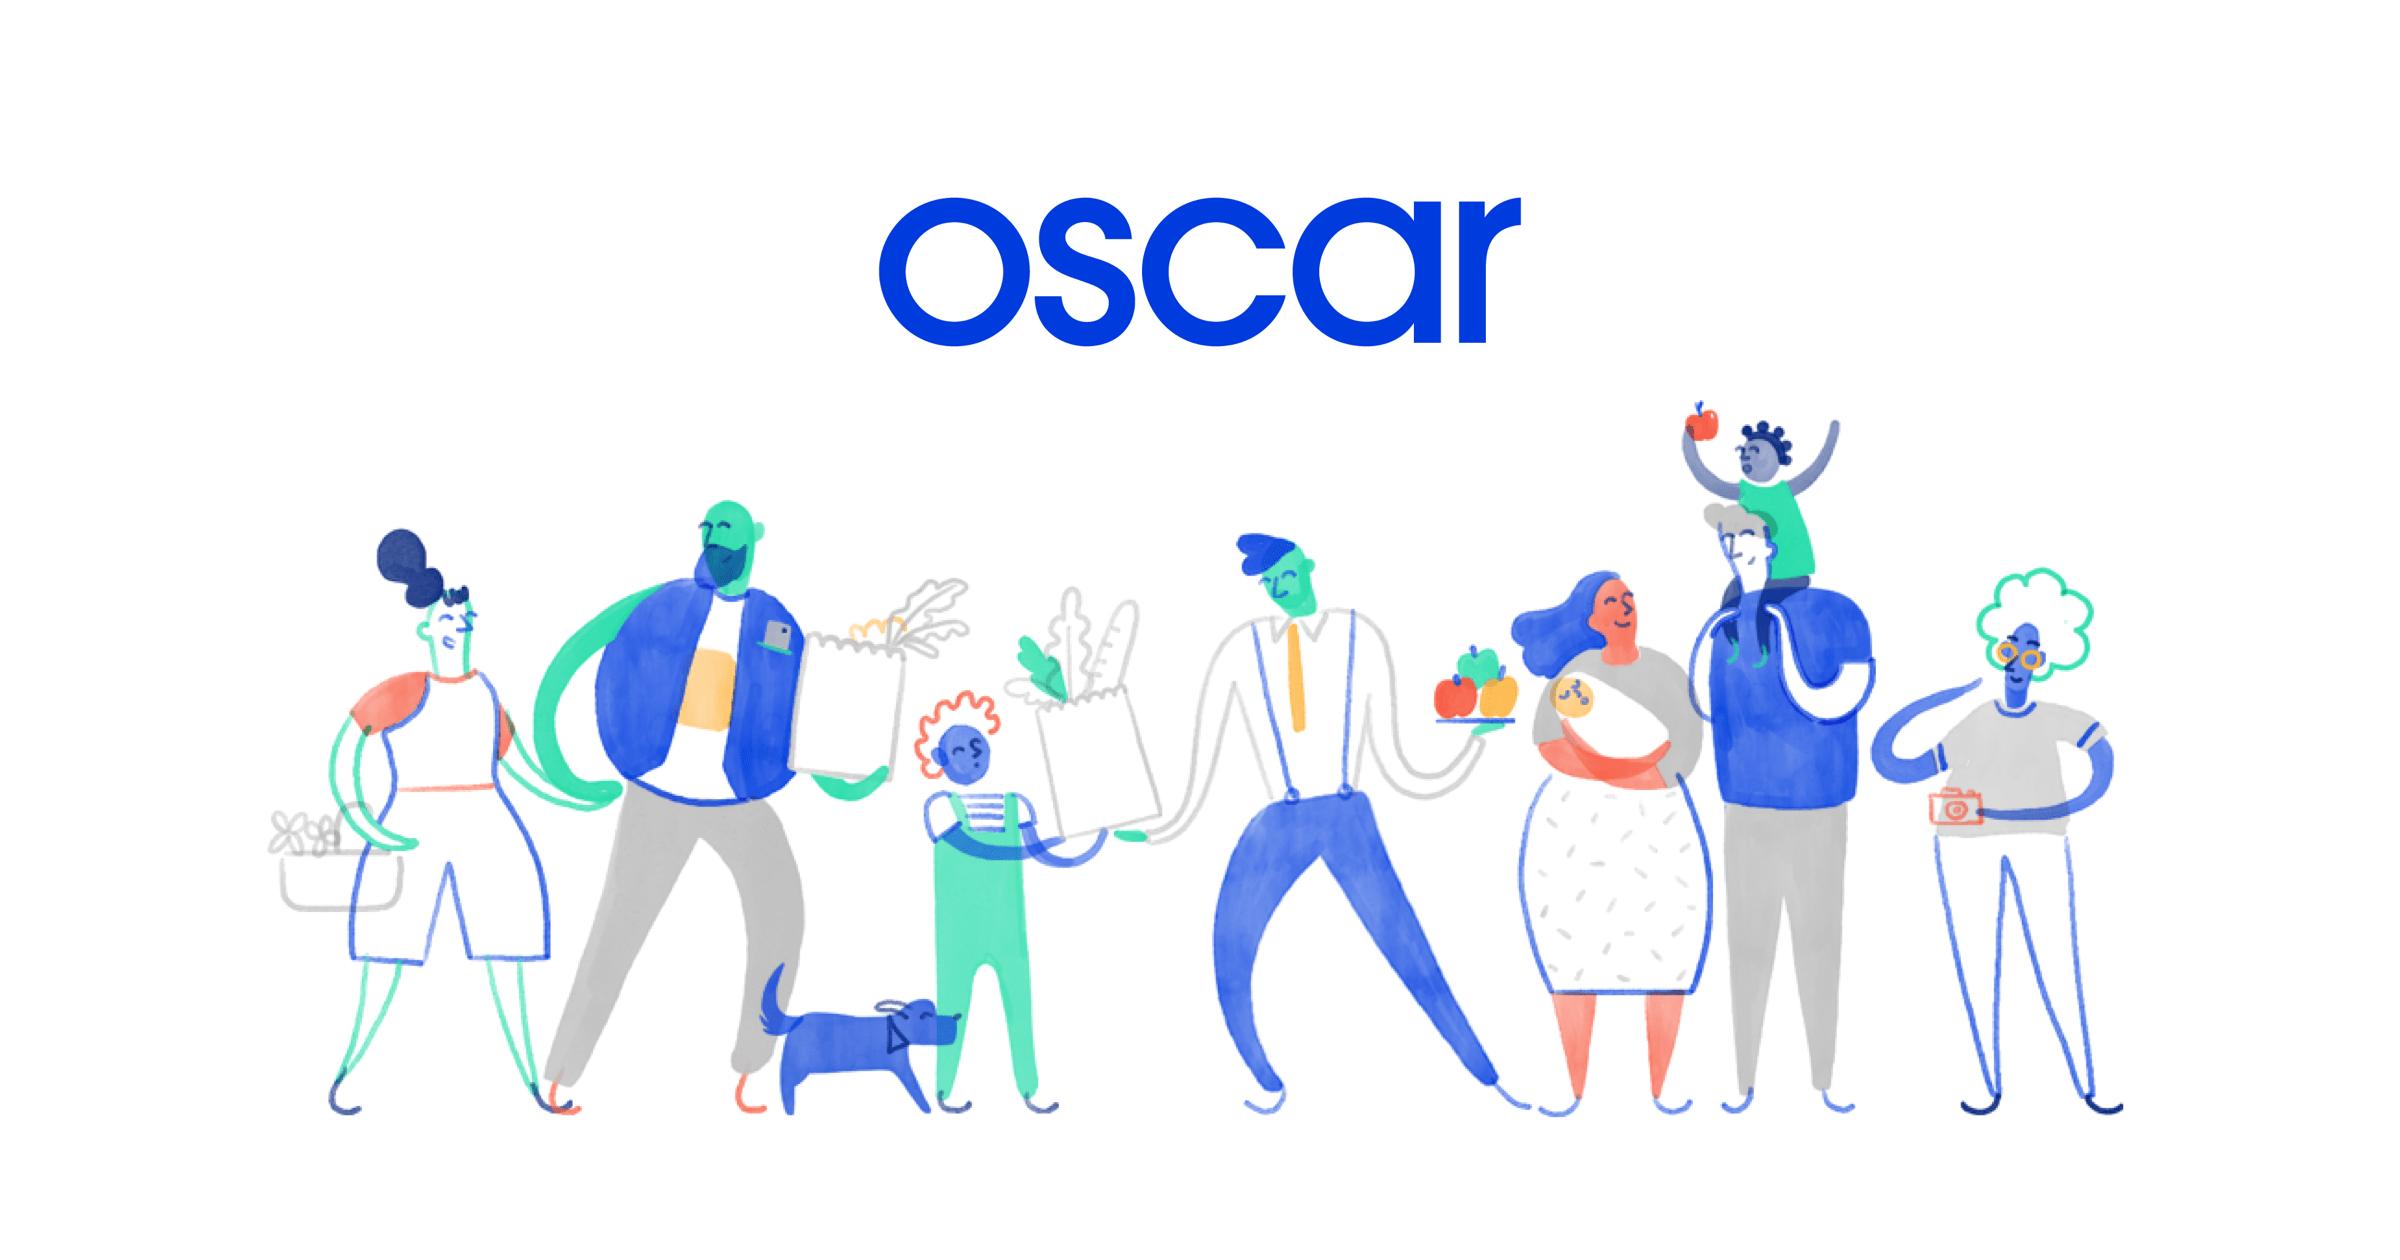 oscar health에 대한 이미지 검색결과